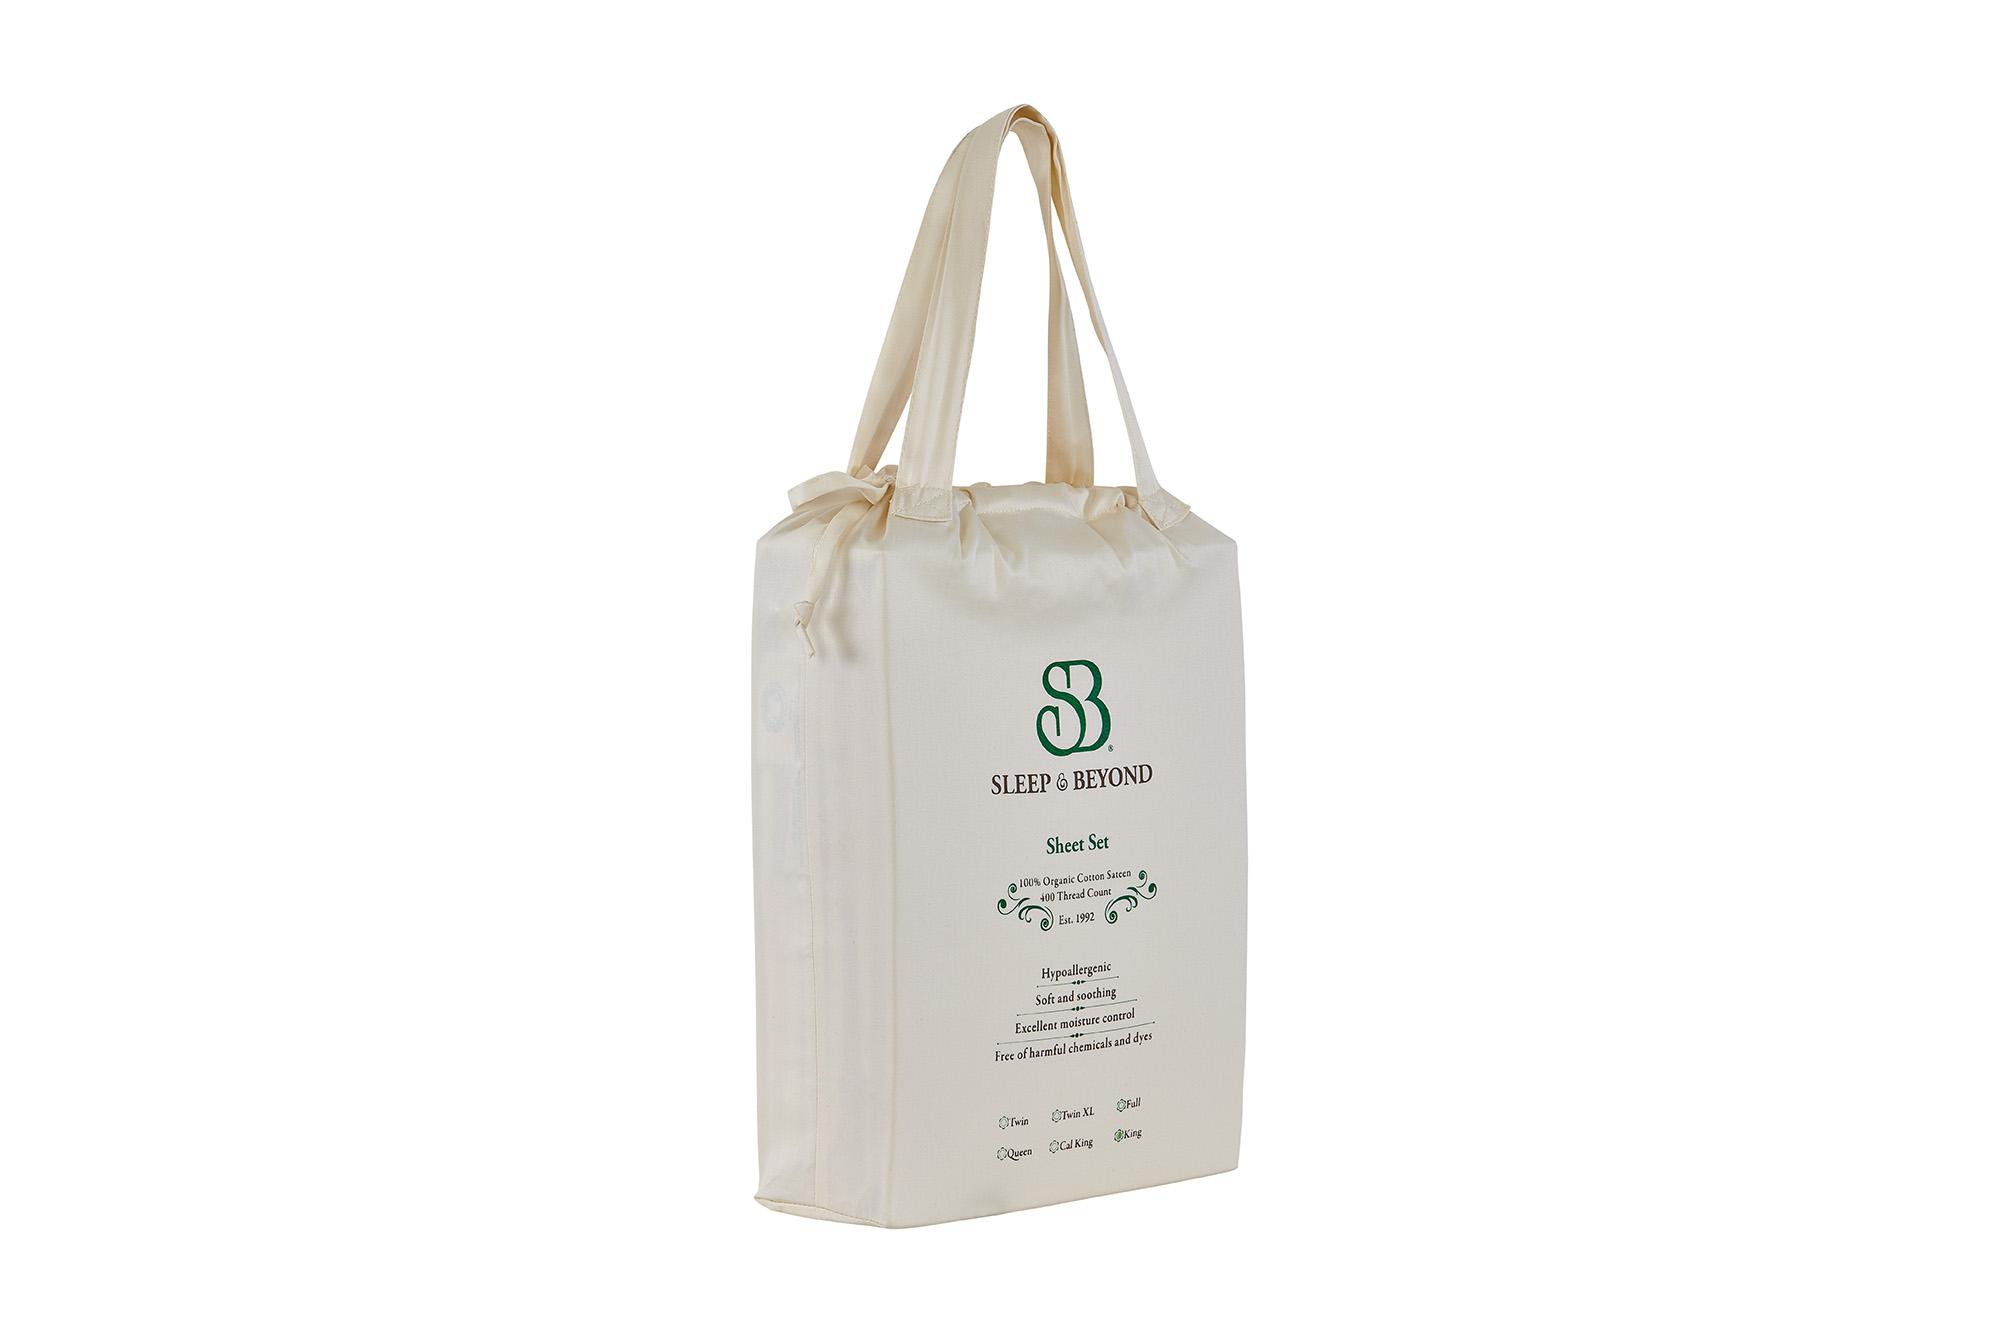 Organic Cotton Sheet Set Packaging Side View